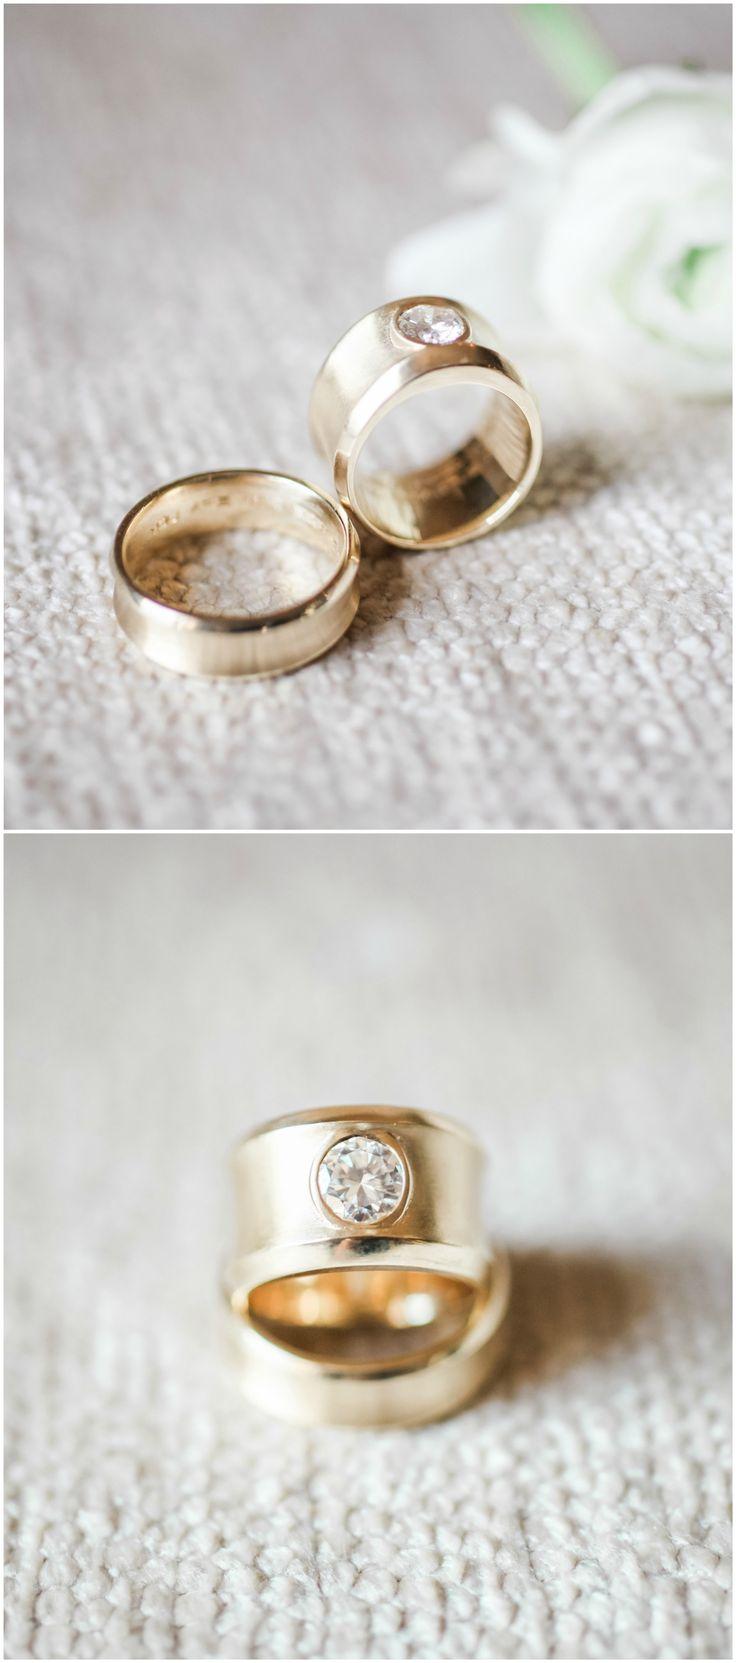 Modern engagement ring, gold, solitaire diamond, wedding band set // b. schwartz photography